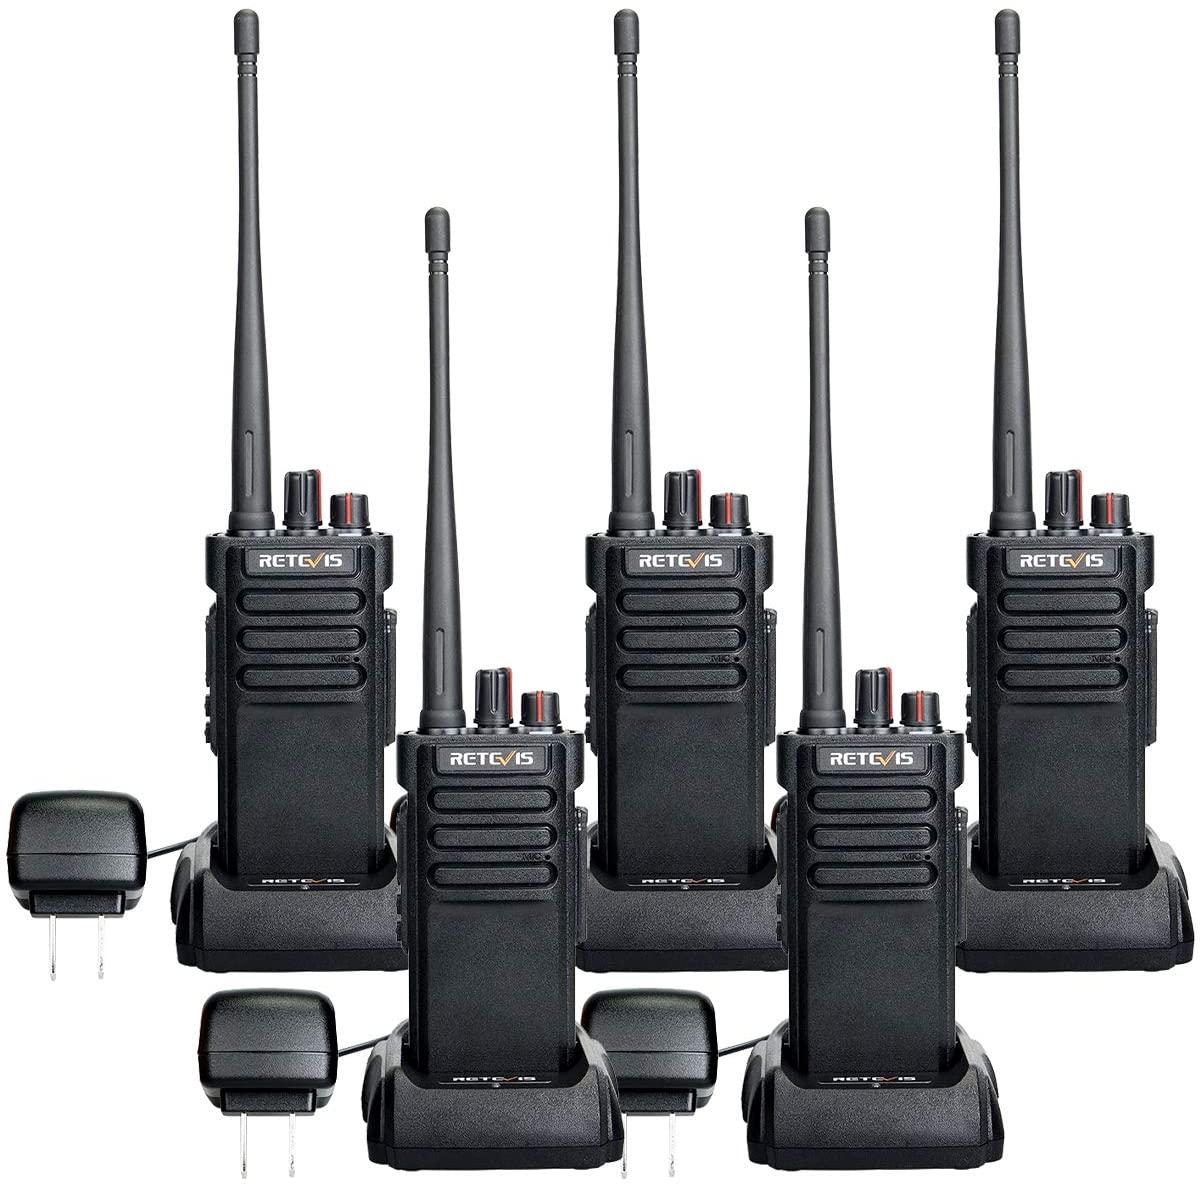 Retevis RT29 Two-Way Radios Long Range Rechargeable 3200mAh Waterproof UHF Heavy Duty High Power Walkie Talkies Long Distance(5 Pack)